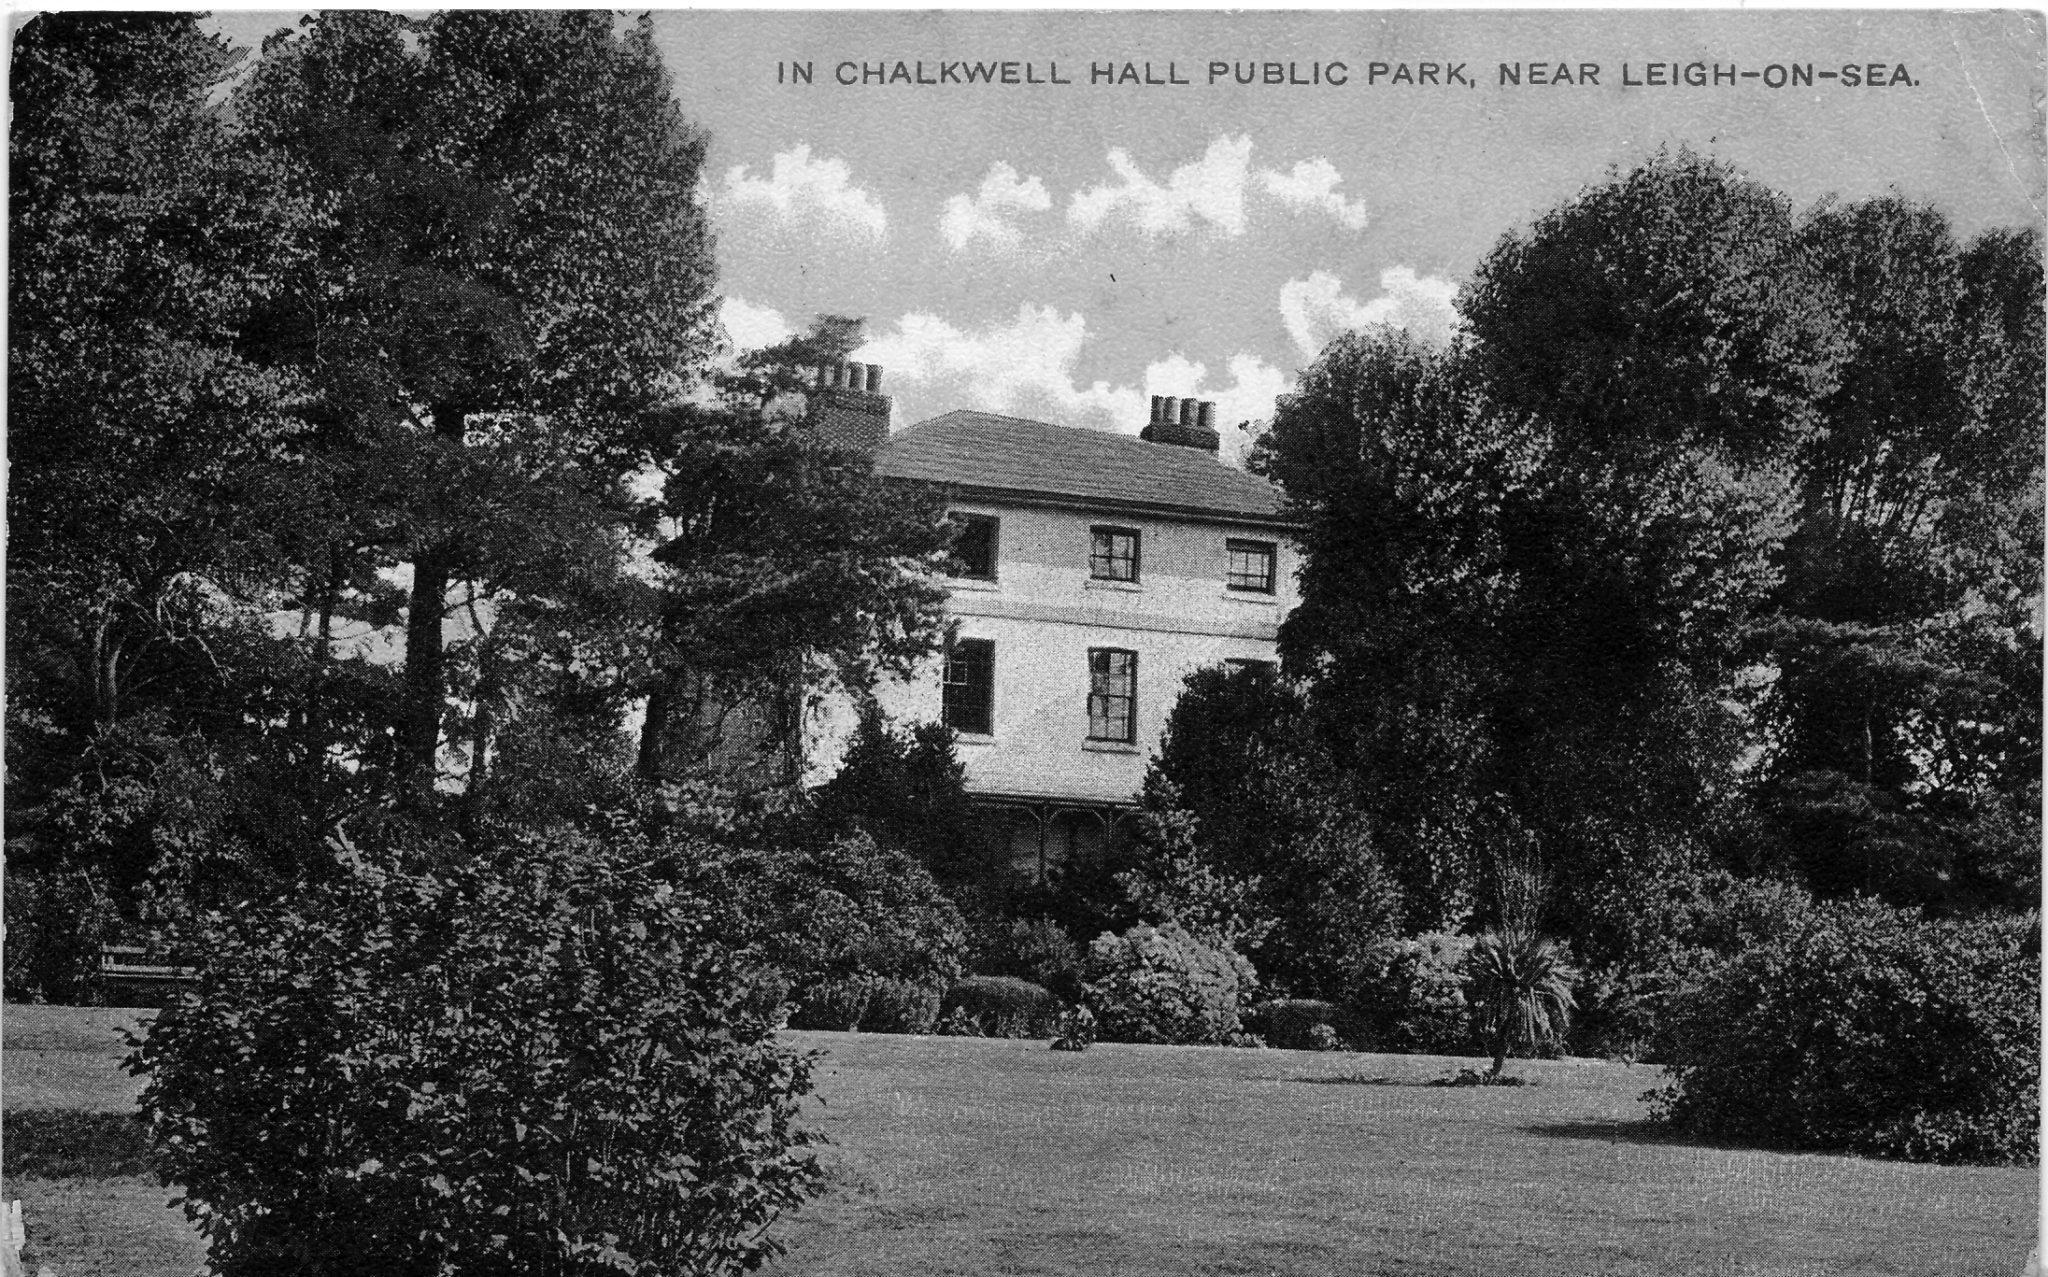 chalkwellhall.jpg